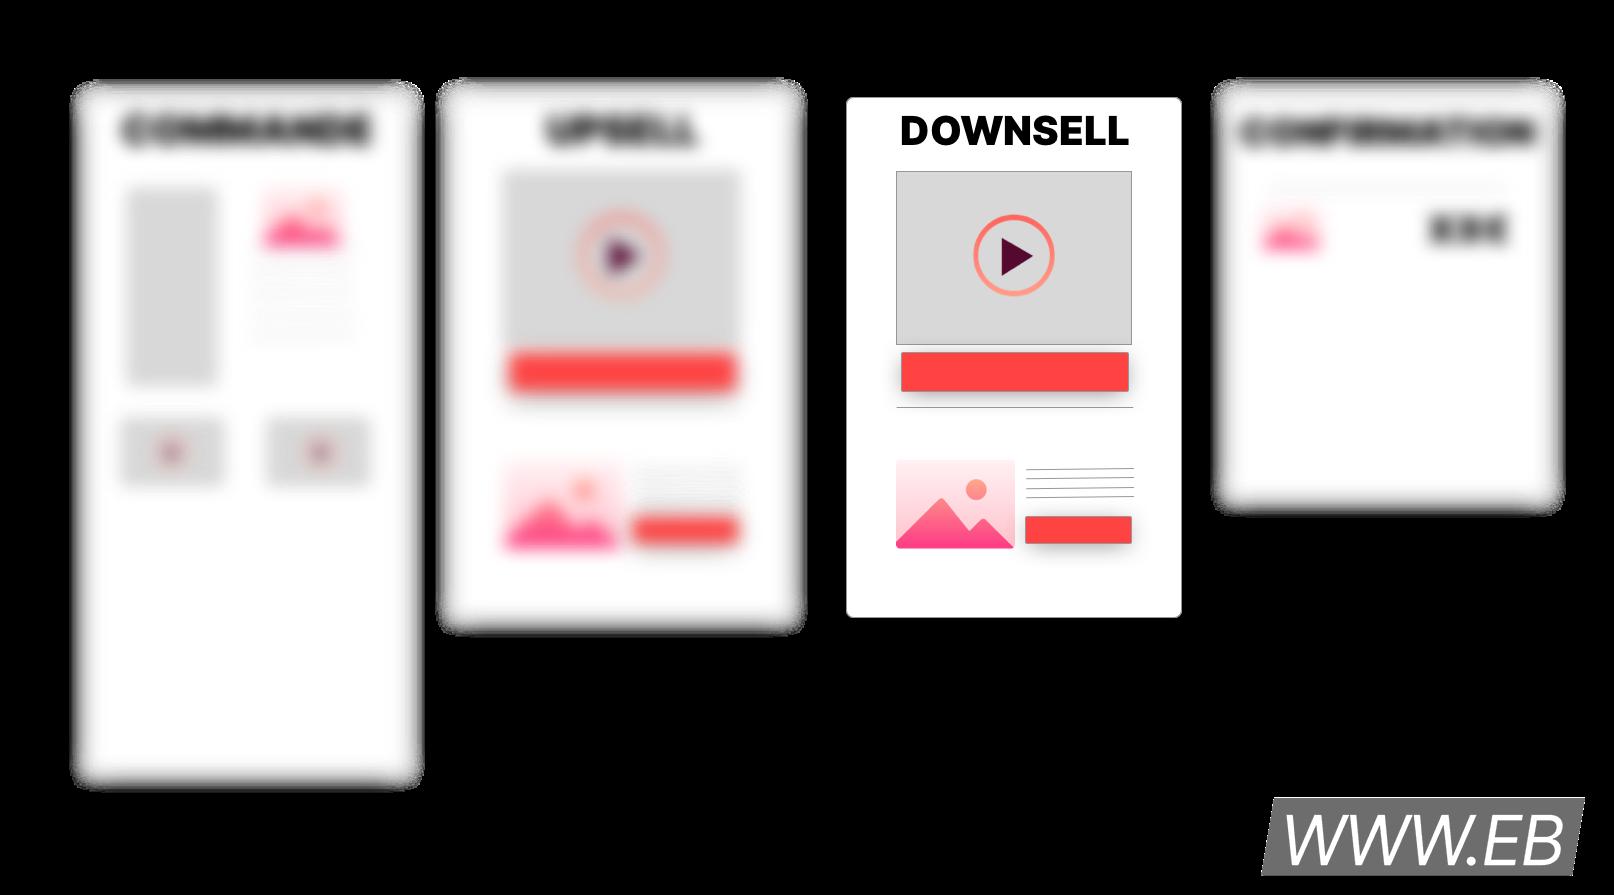 Schéma de tunnel de vente mettant en avant la page de downsell